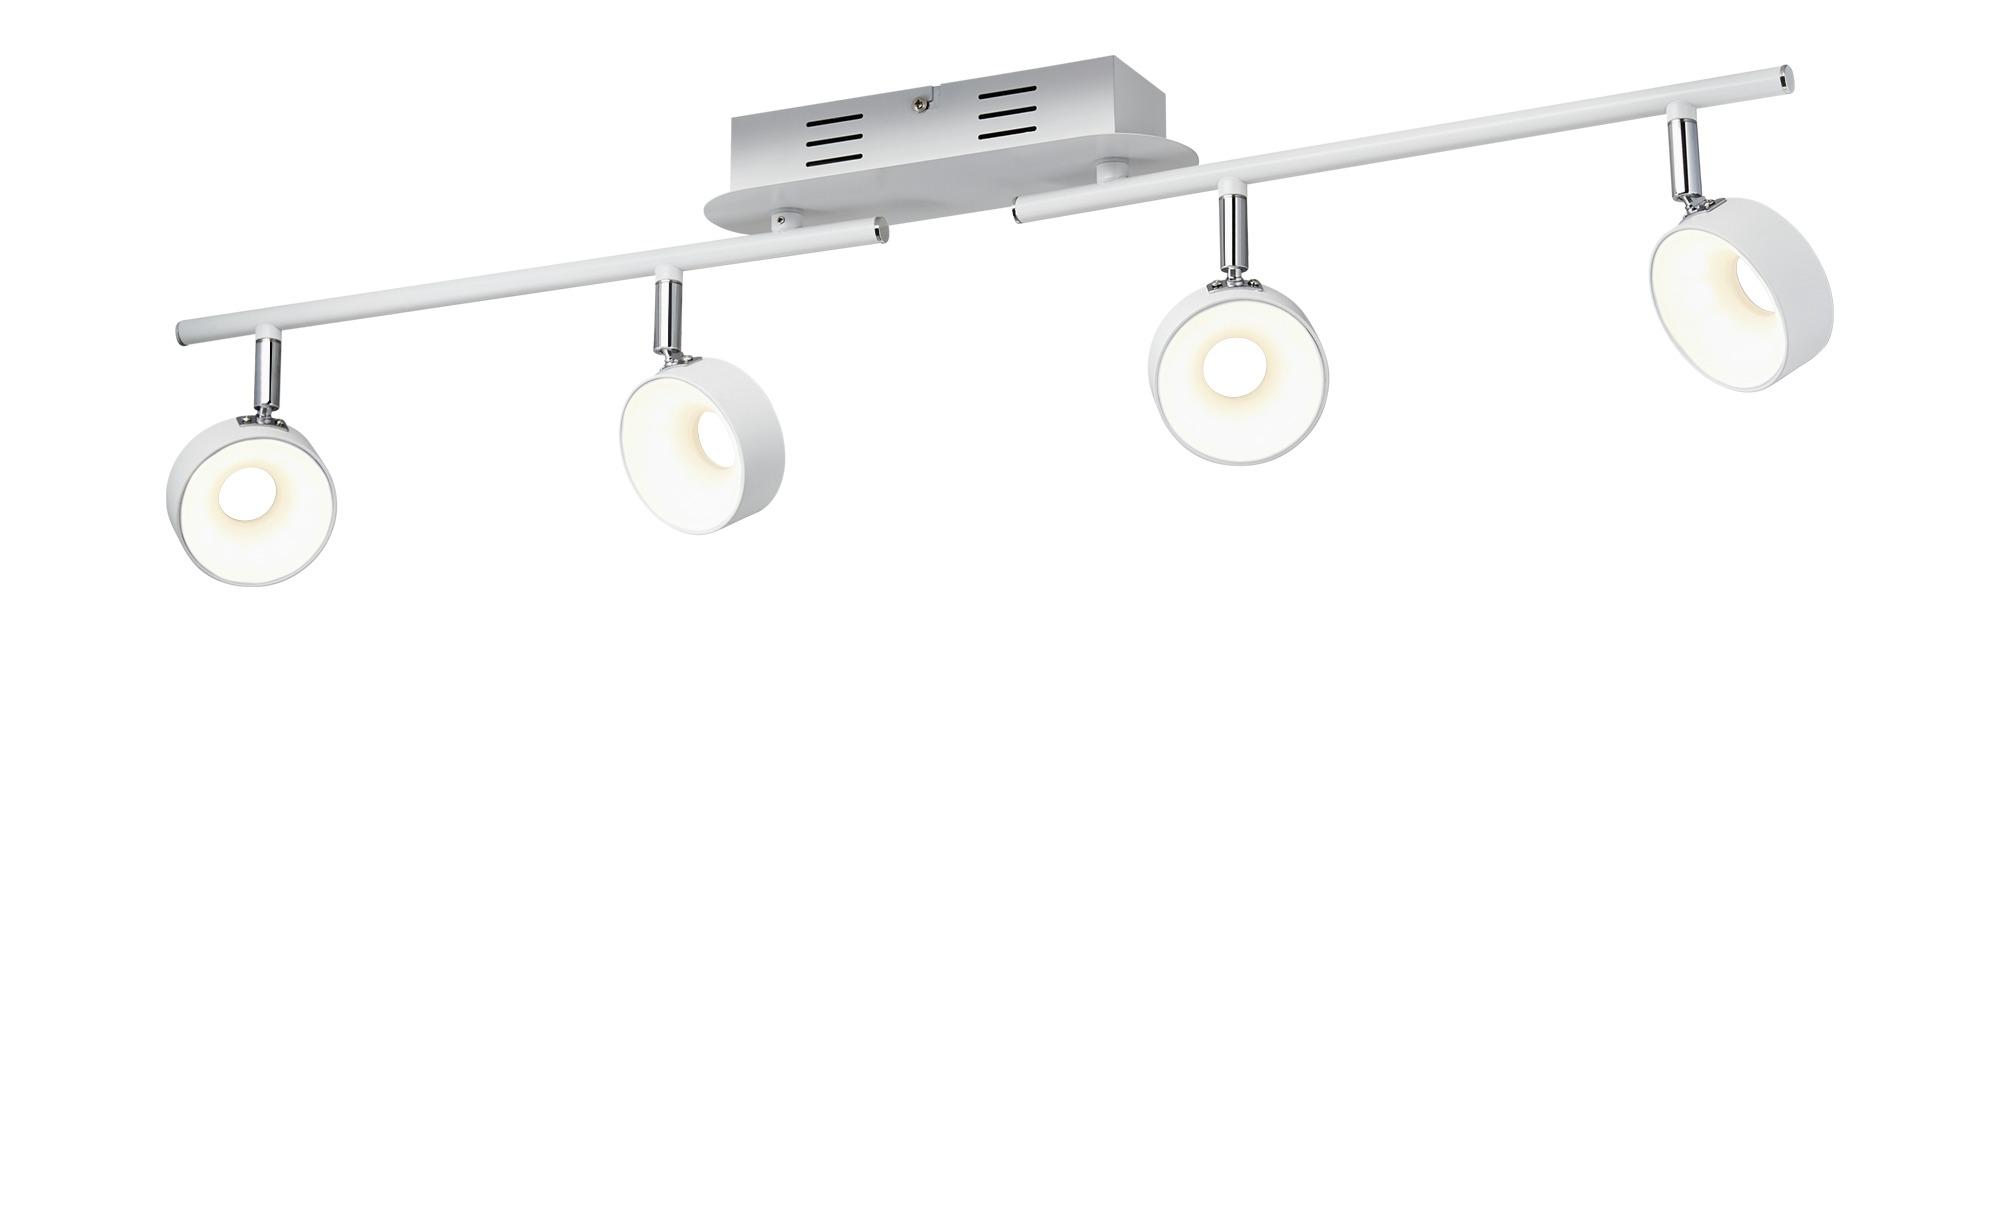 KHG LED-Spot 4-flammig weiß ¦ weiß ¦ Maße (cm): B: 8 H: 18,5 Lampen & Leuchten > LED-Leuchten > LED-Strahler & Spots - Höffner